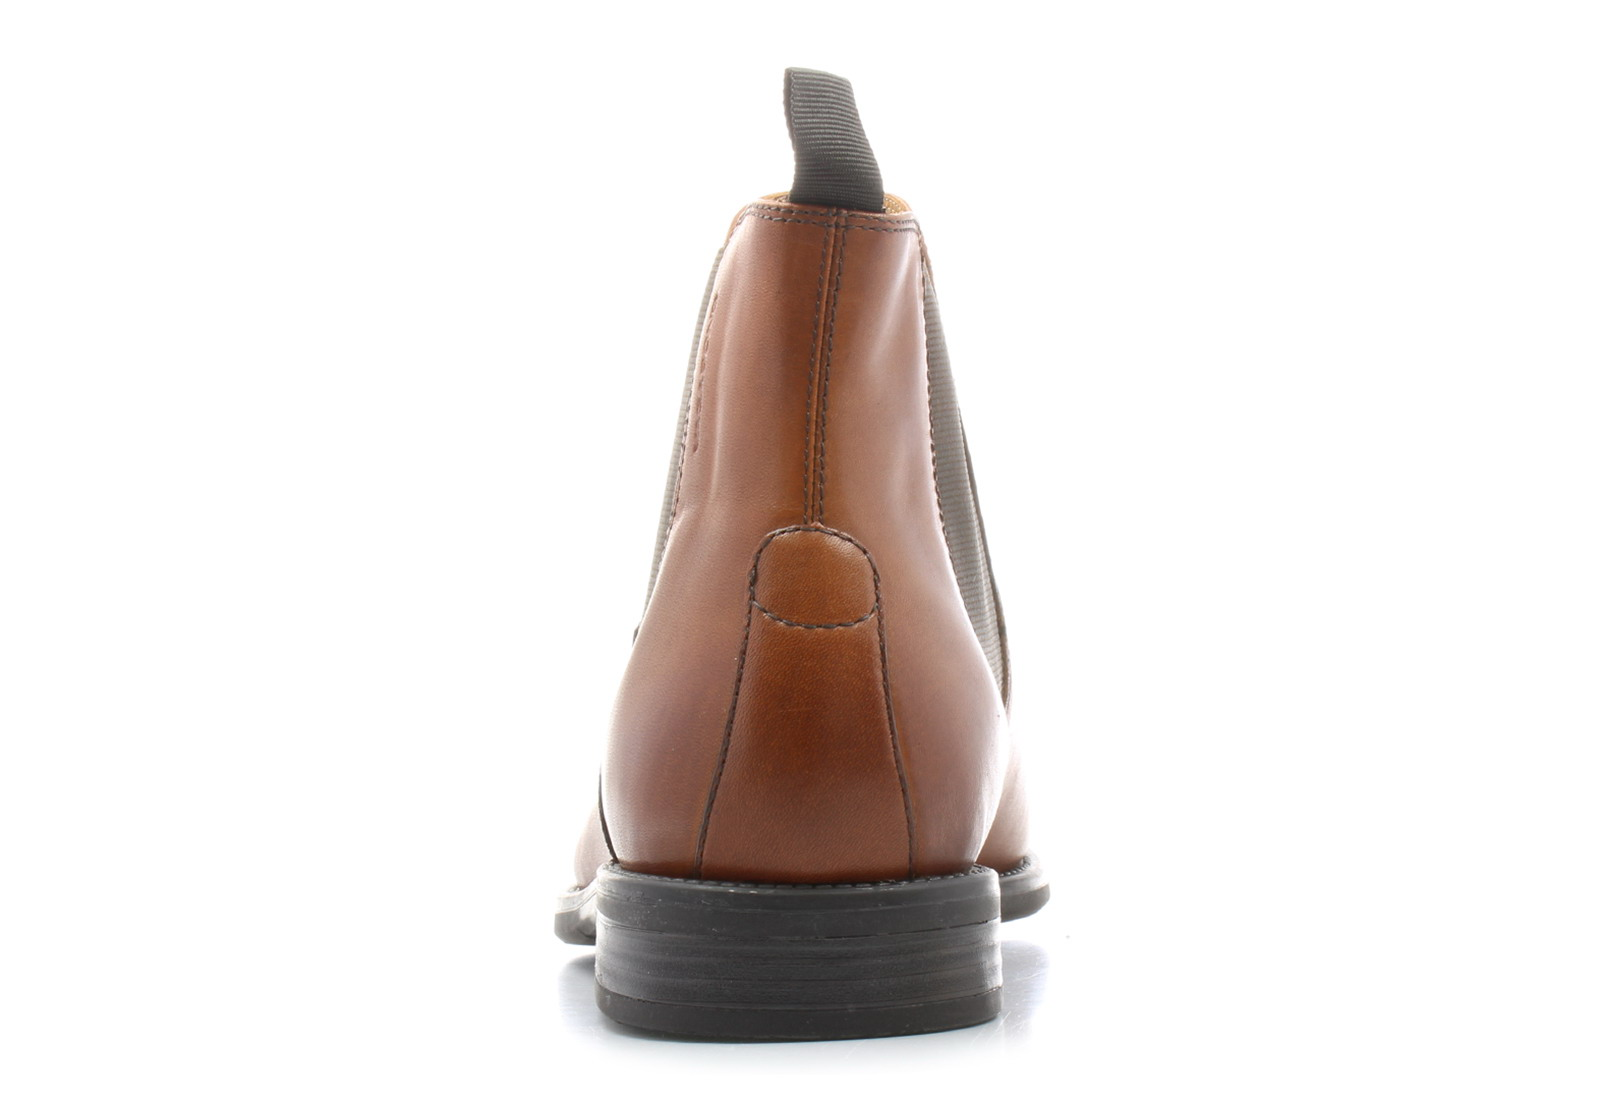 Vagabond Boots - Salvatore - 4464-001-27 - Online shop for sneakers ... e145856b5f